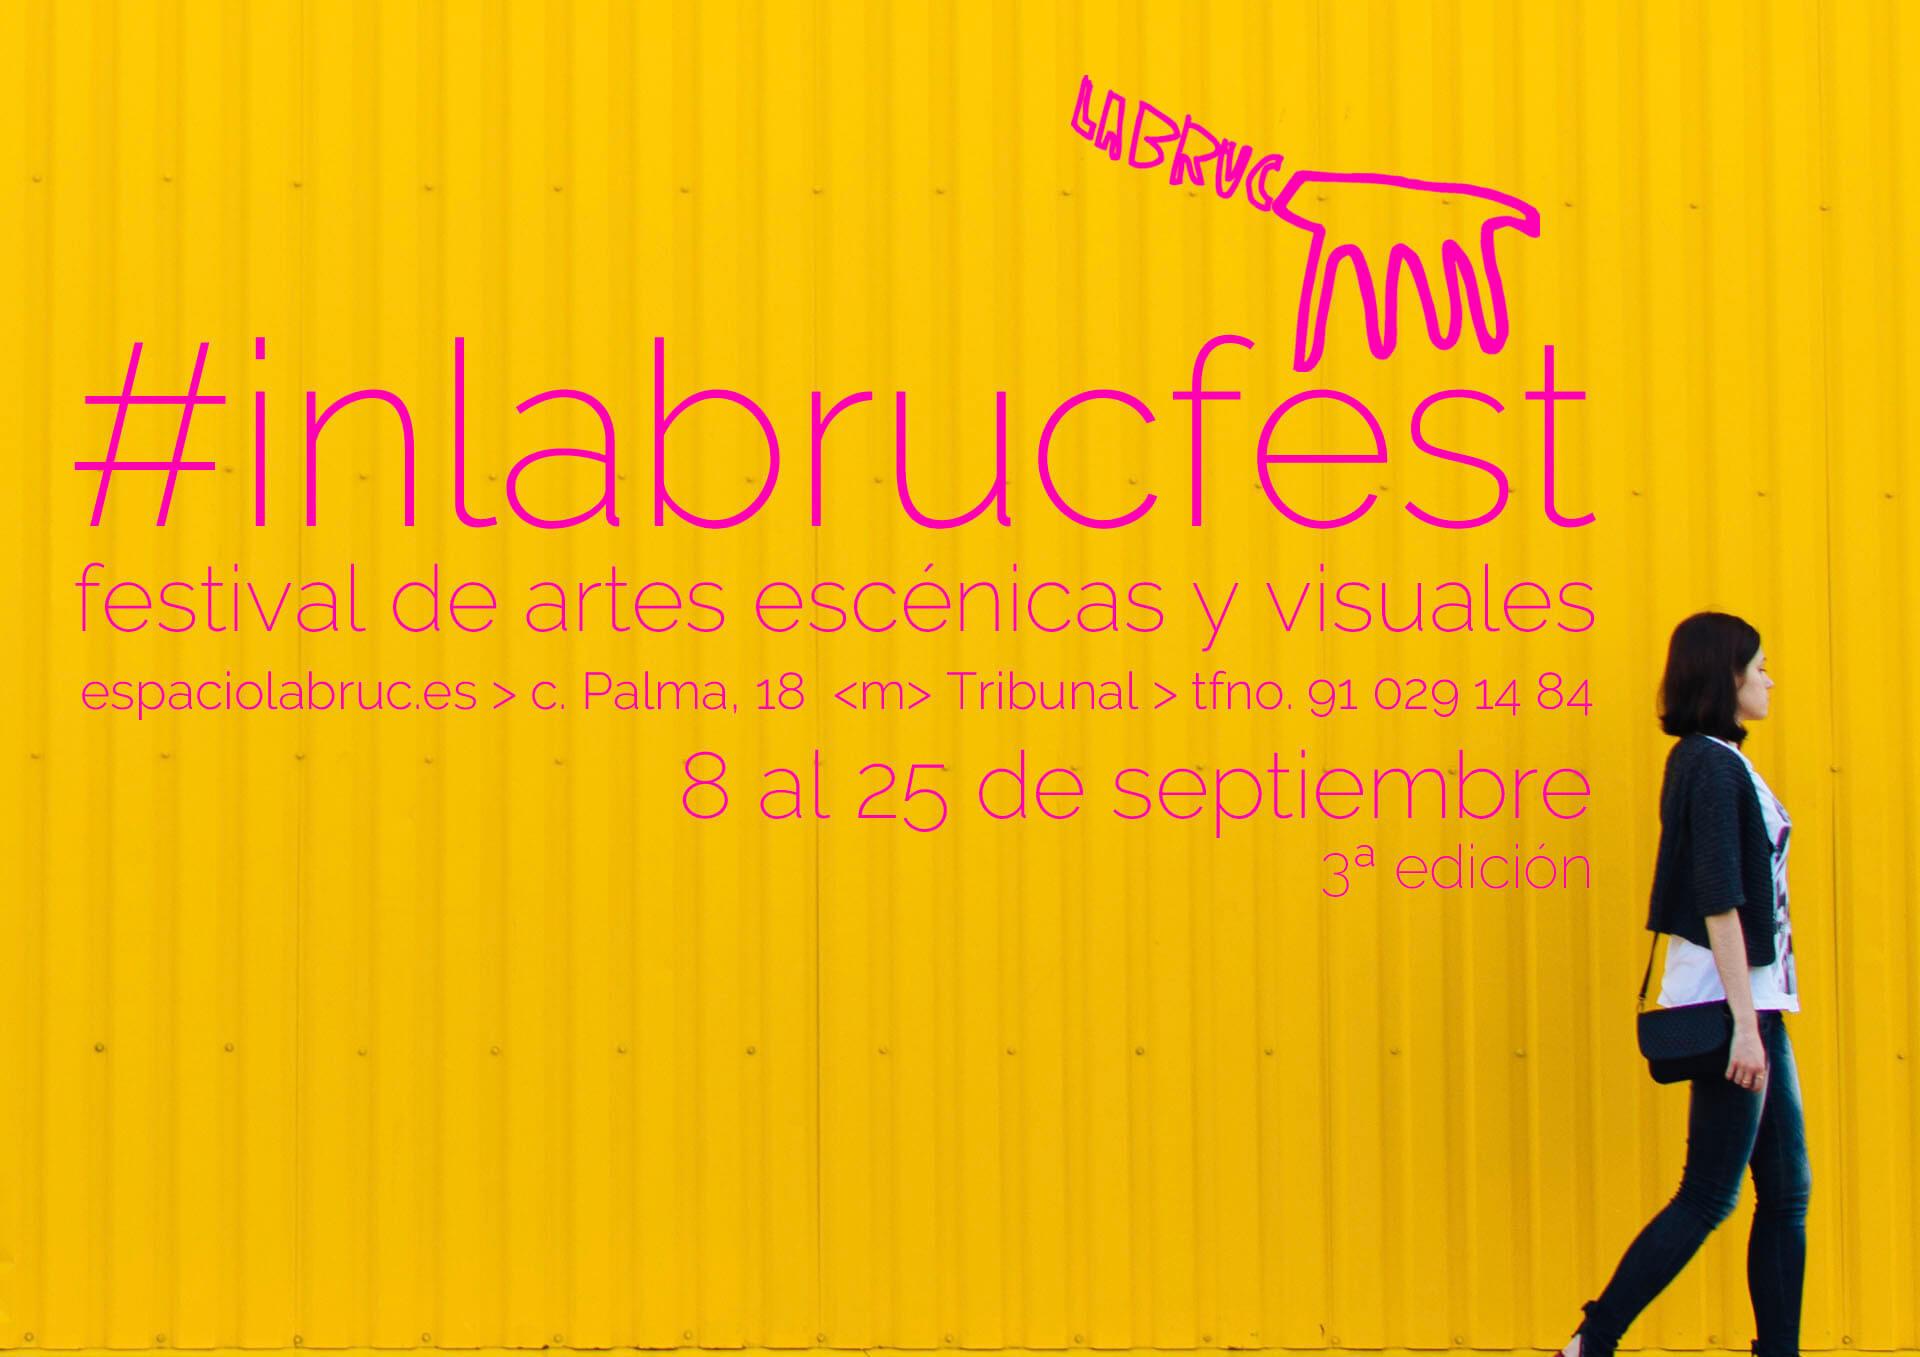 00_cabecera web full inlabrucfest